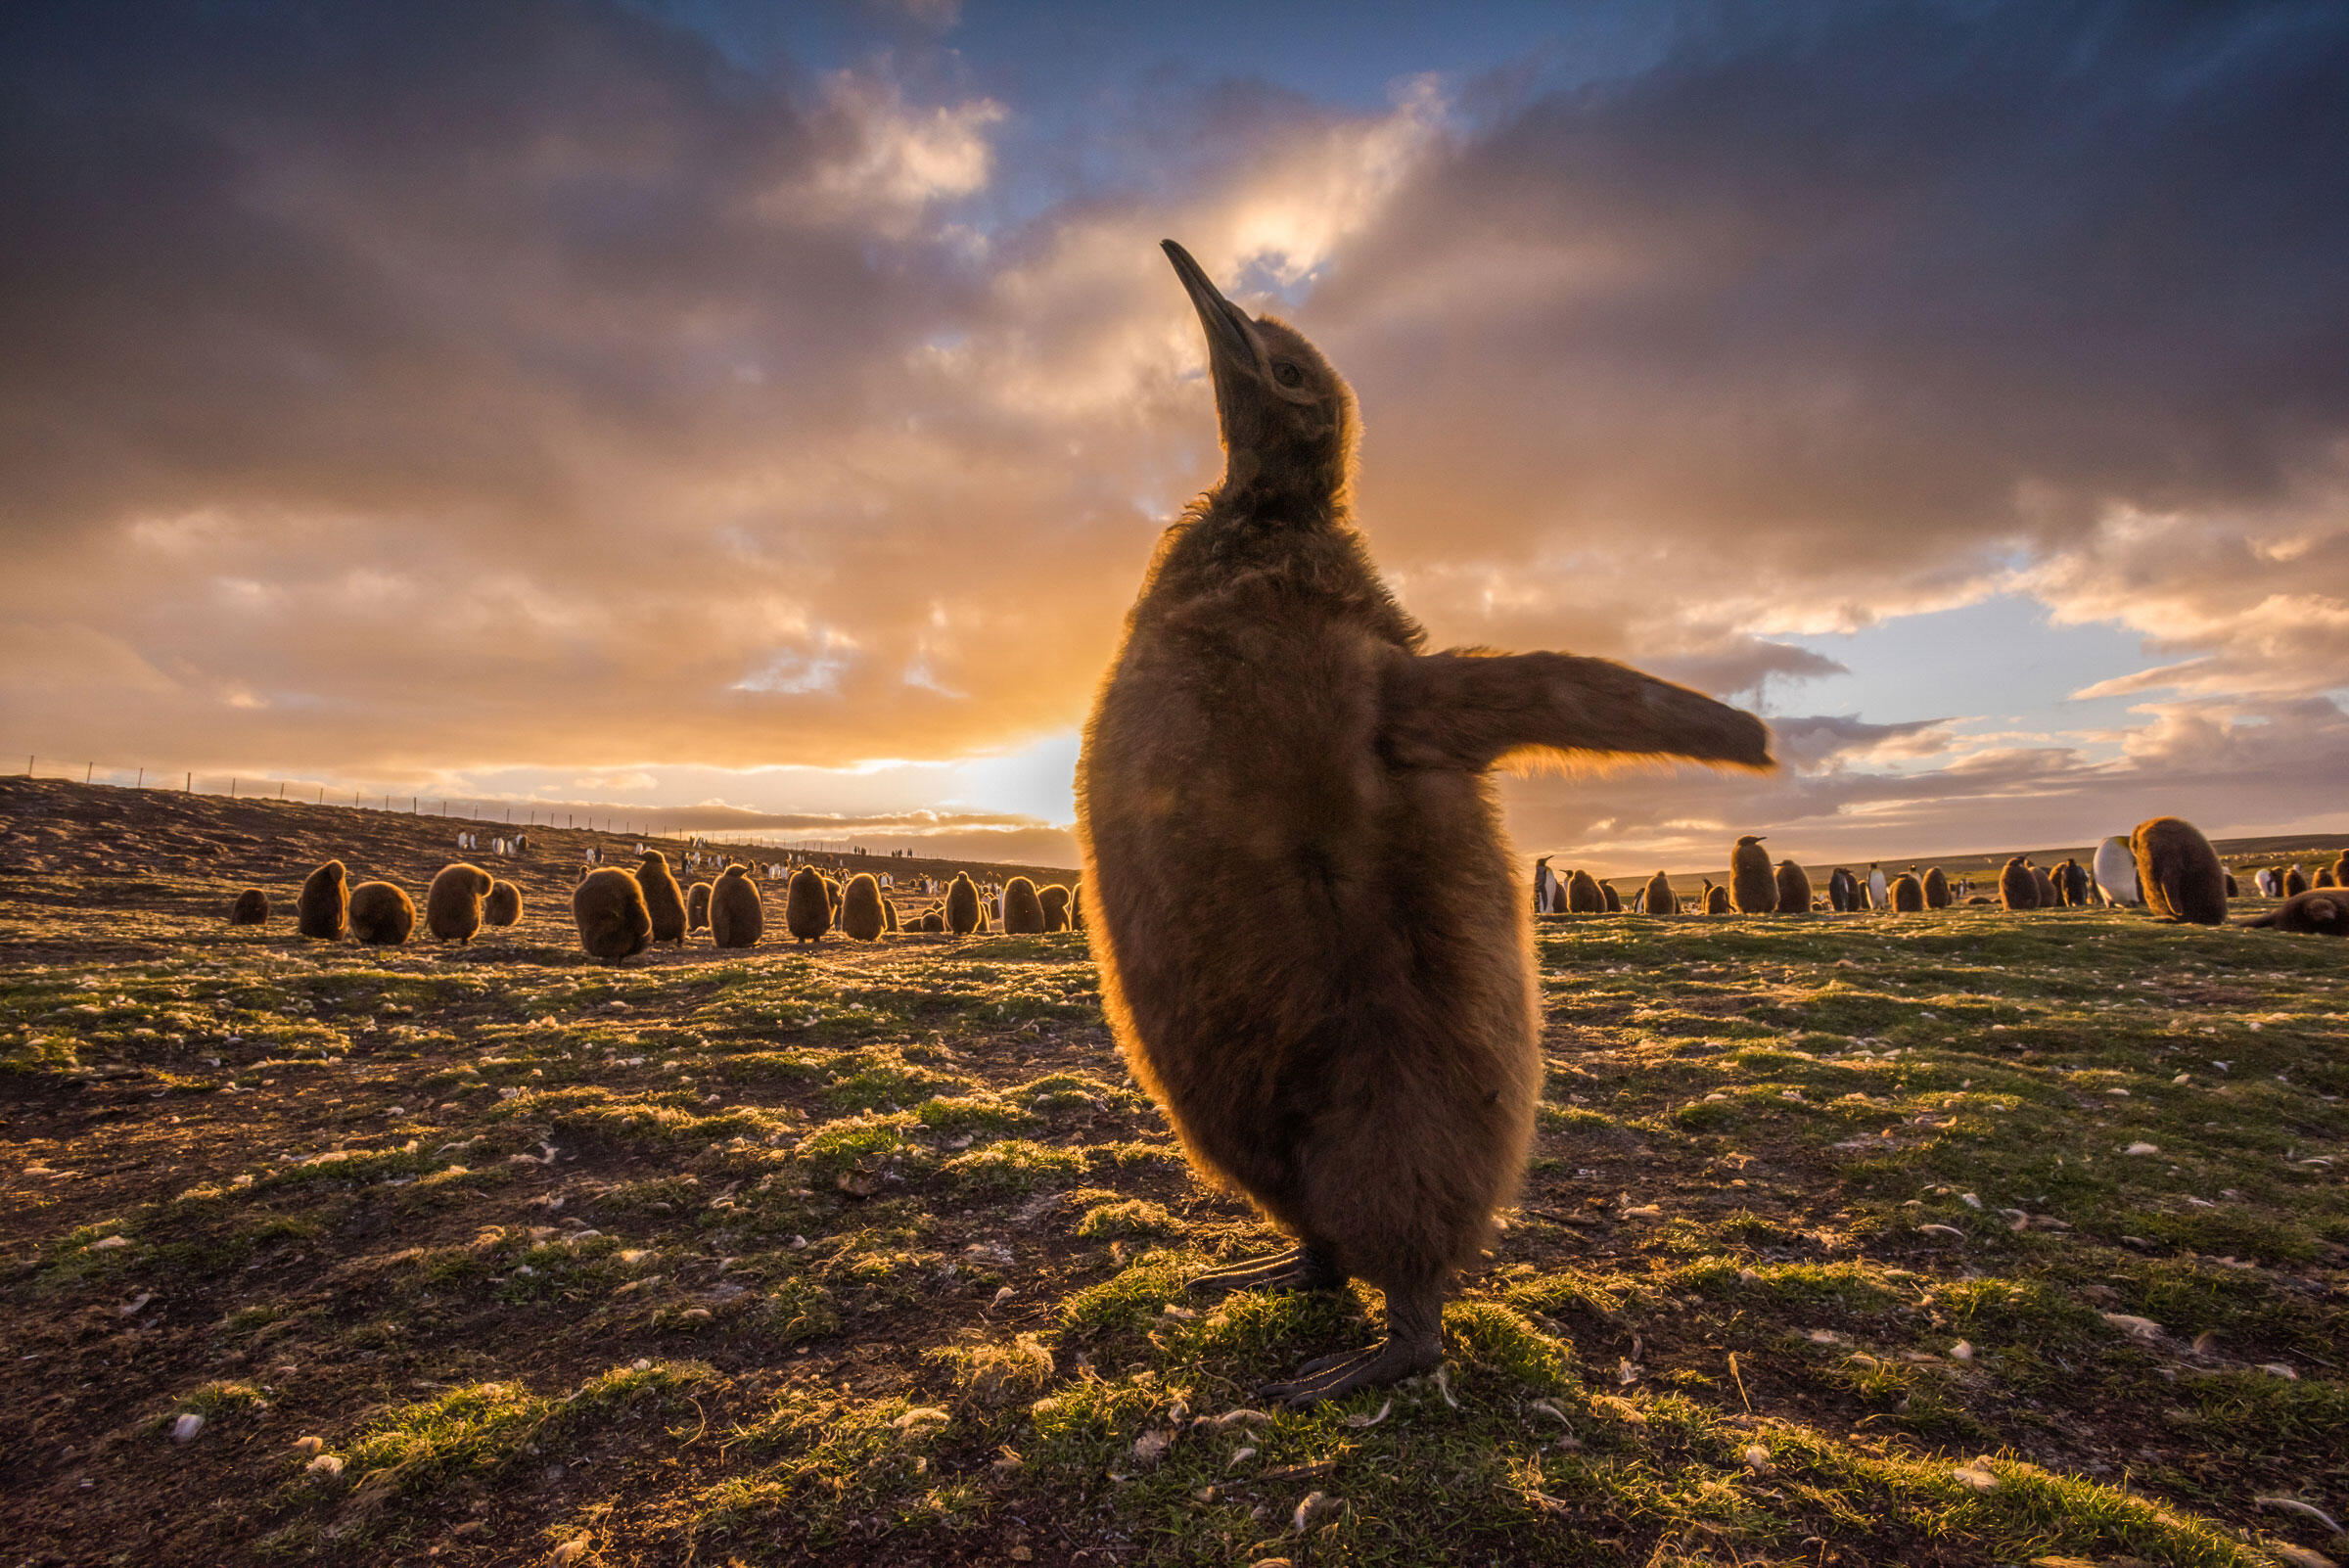 King Penguins/Amateur Category. Sean Crane/Audubon Photography Awards